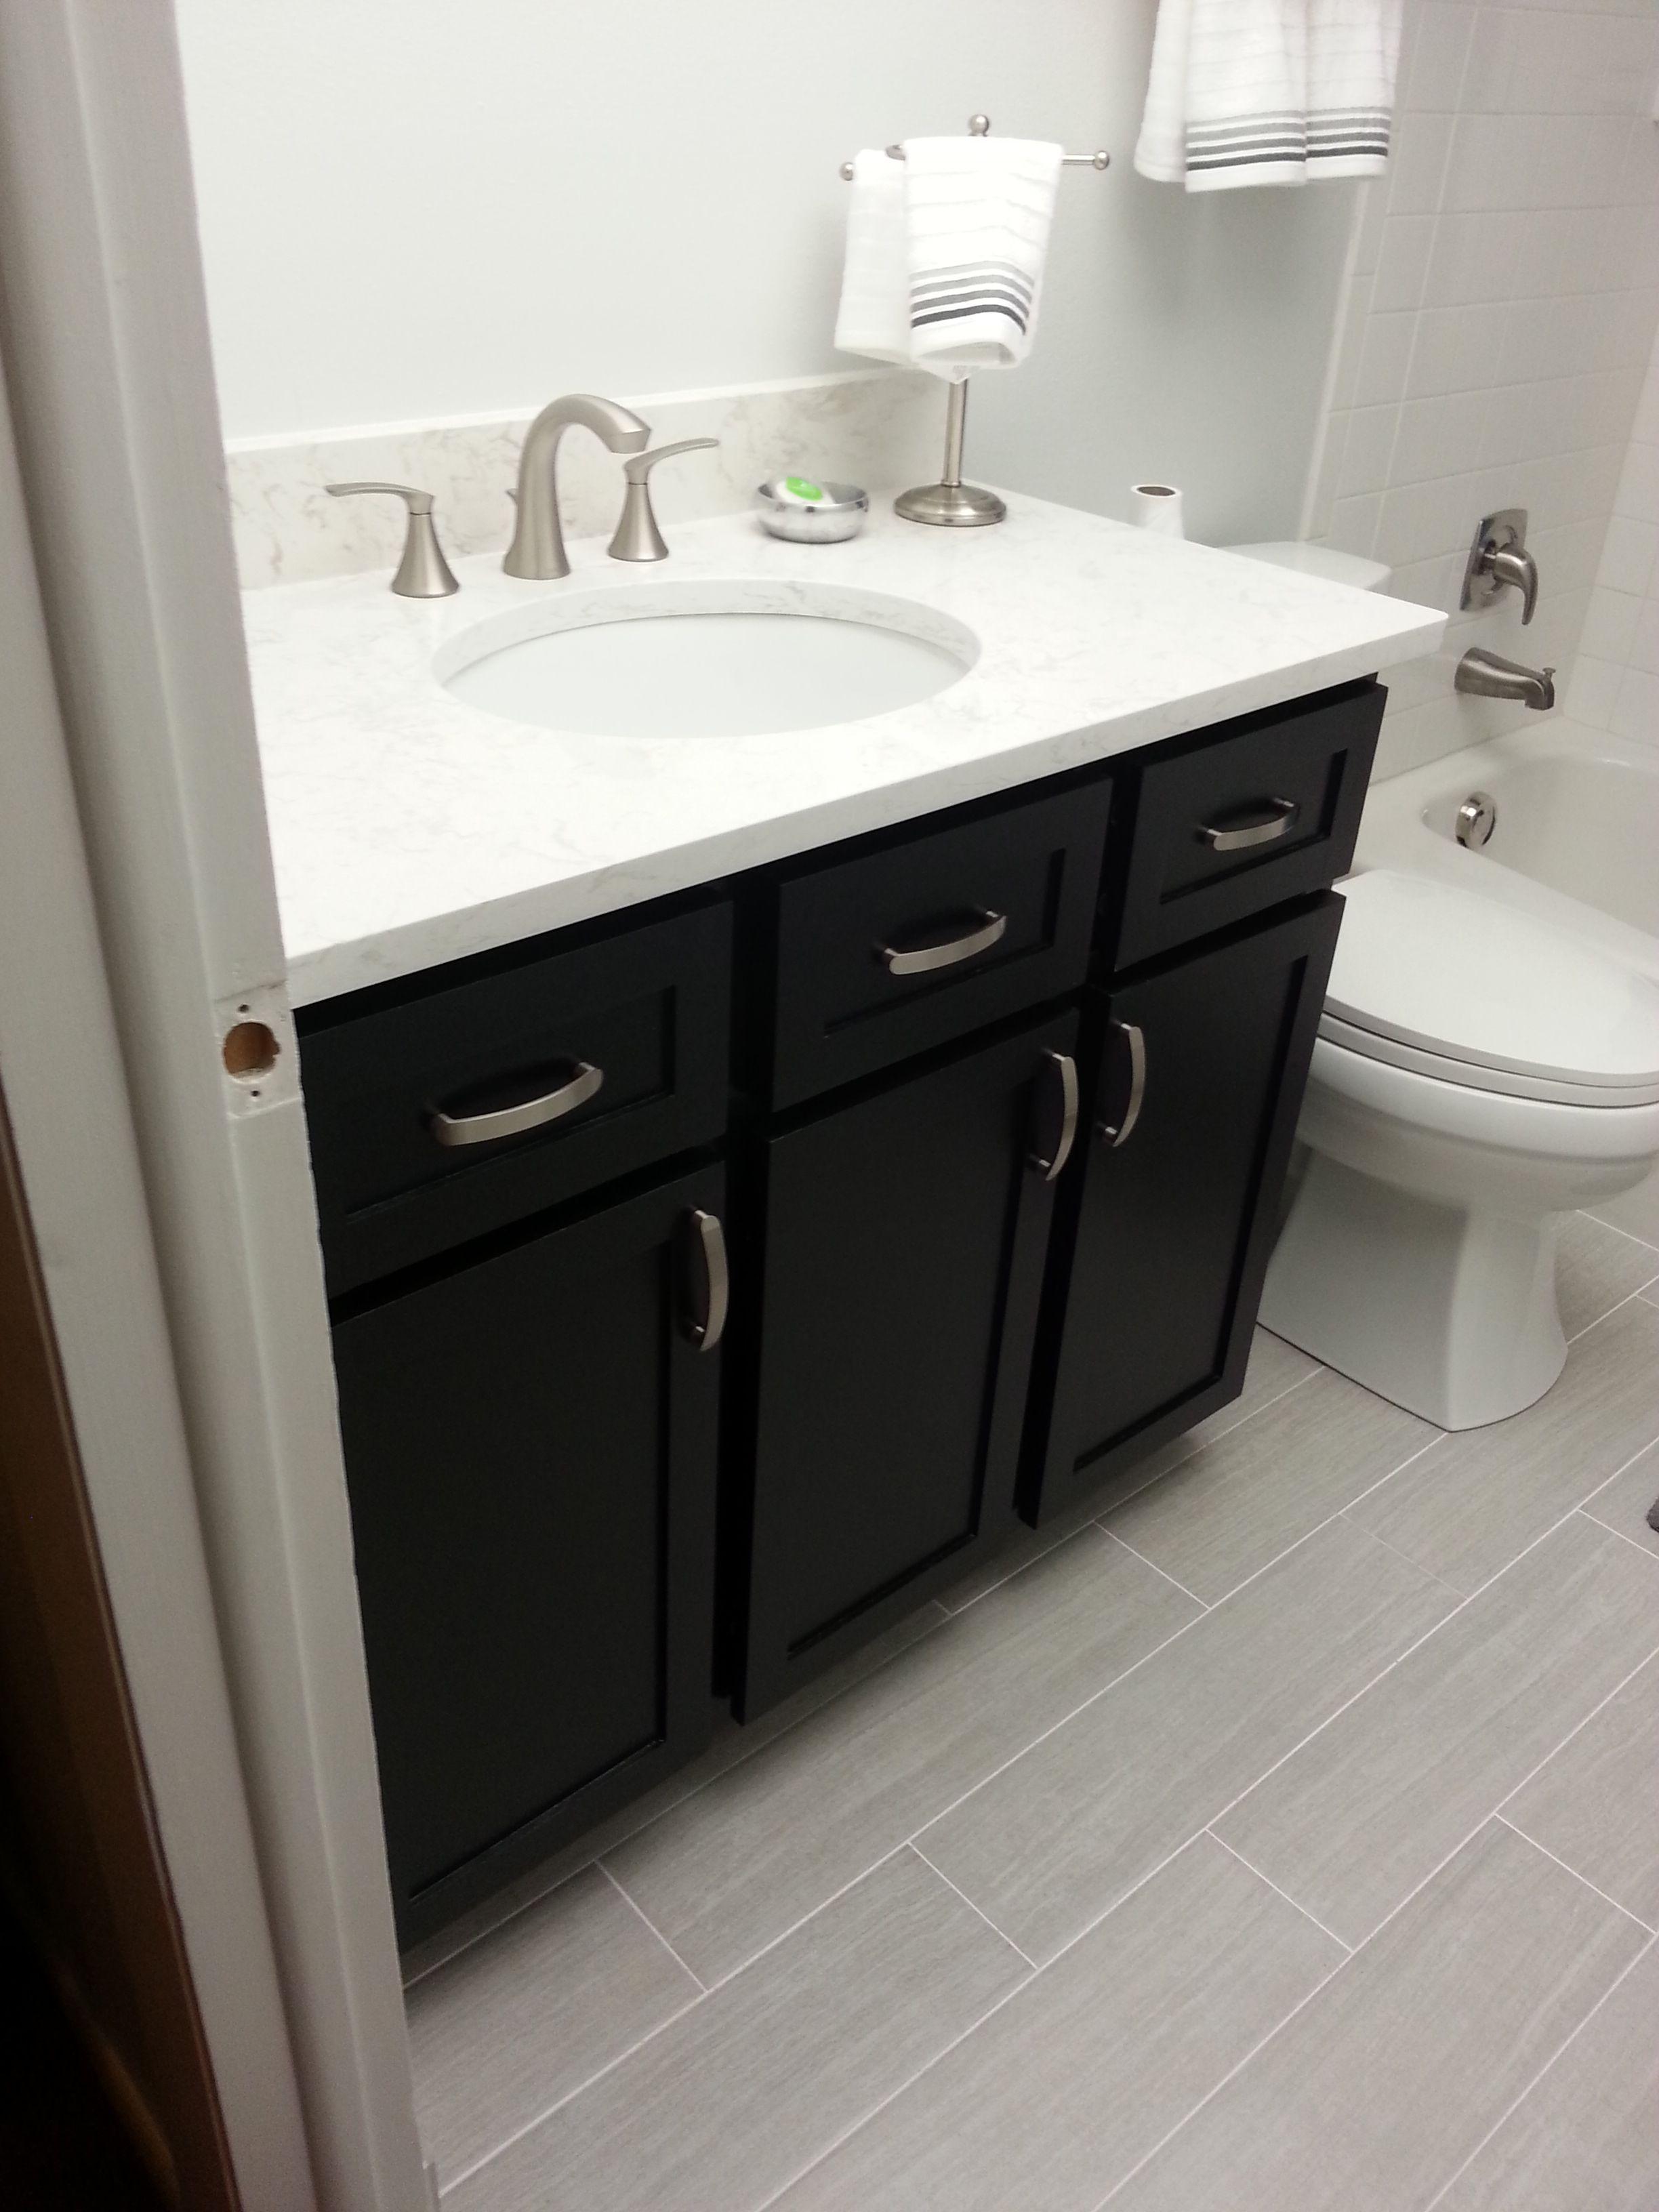 96 inch bathroom vanity - 96 Inch Bathroom Vanity 83